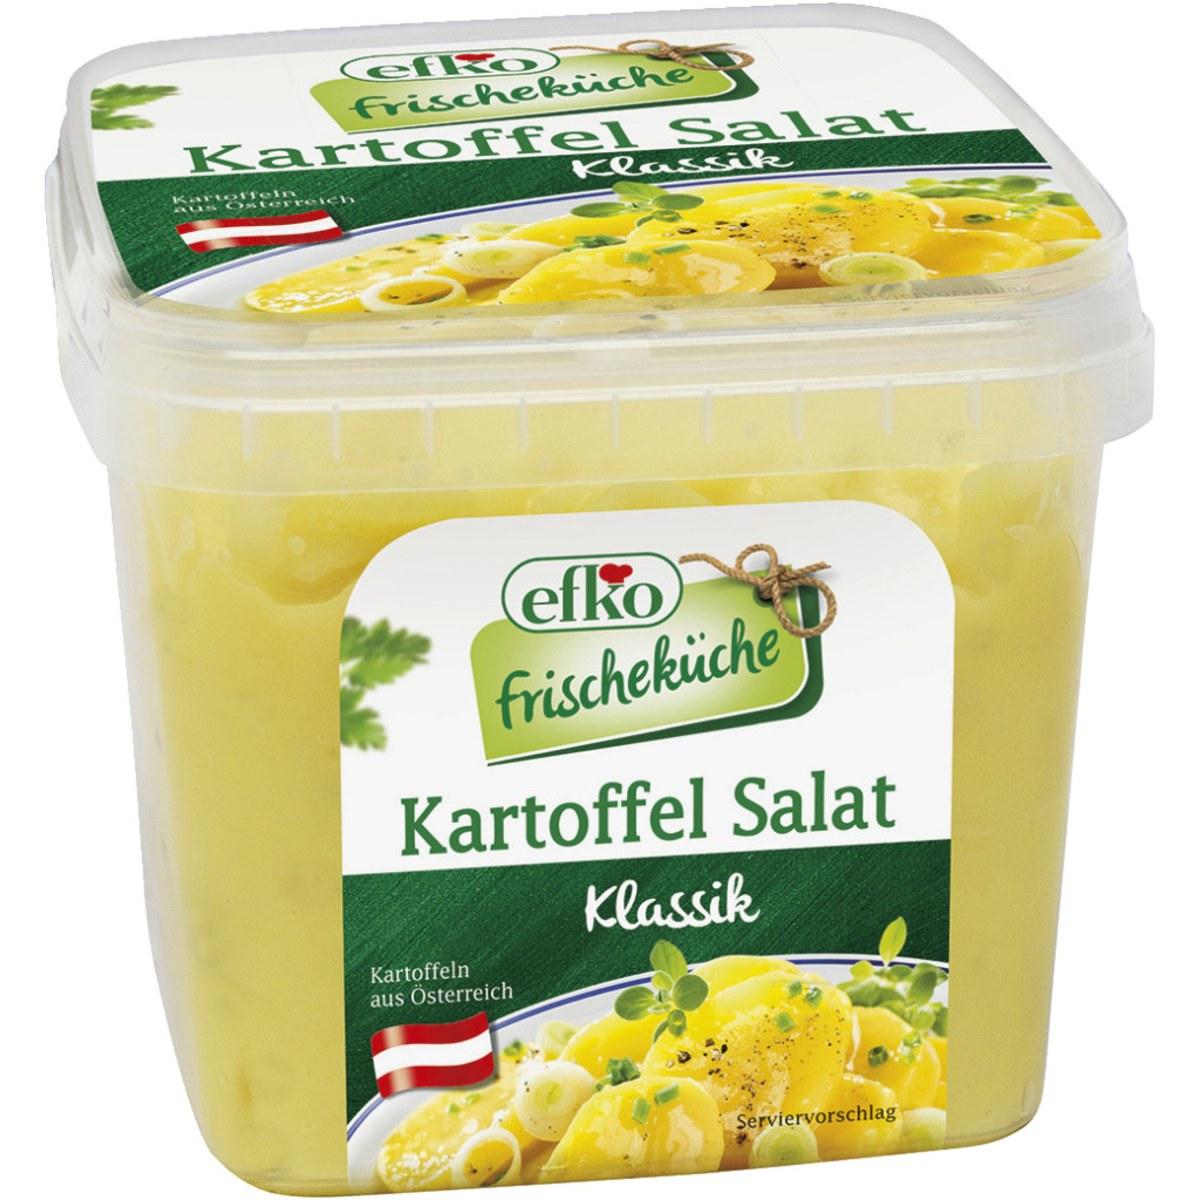 Efko Kartoffel Salat Klassik